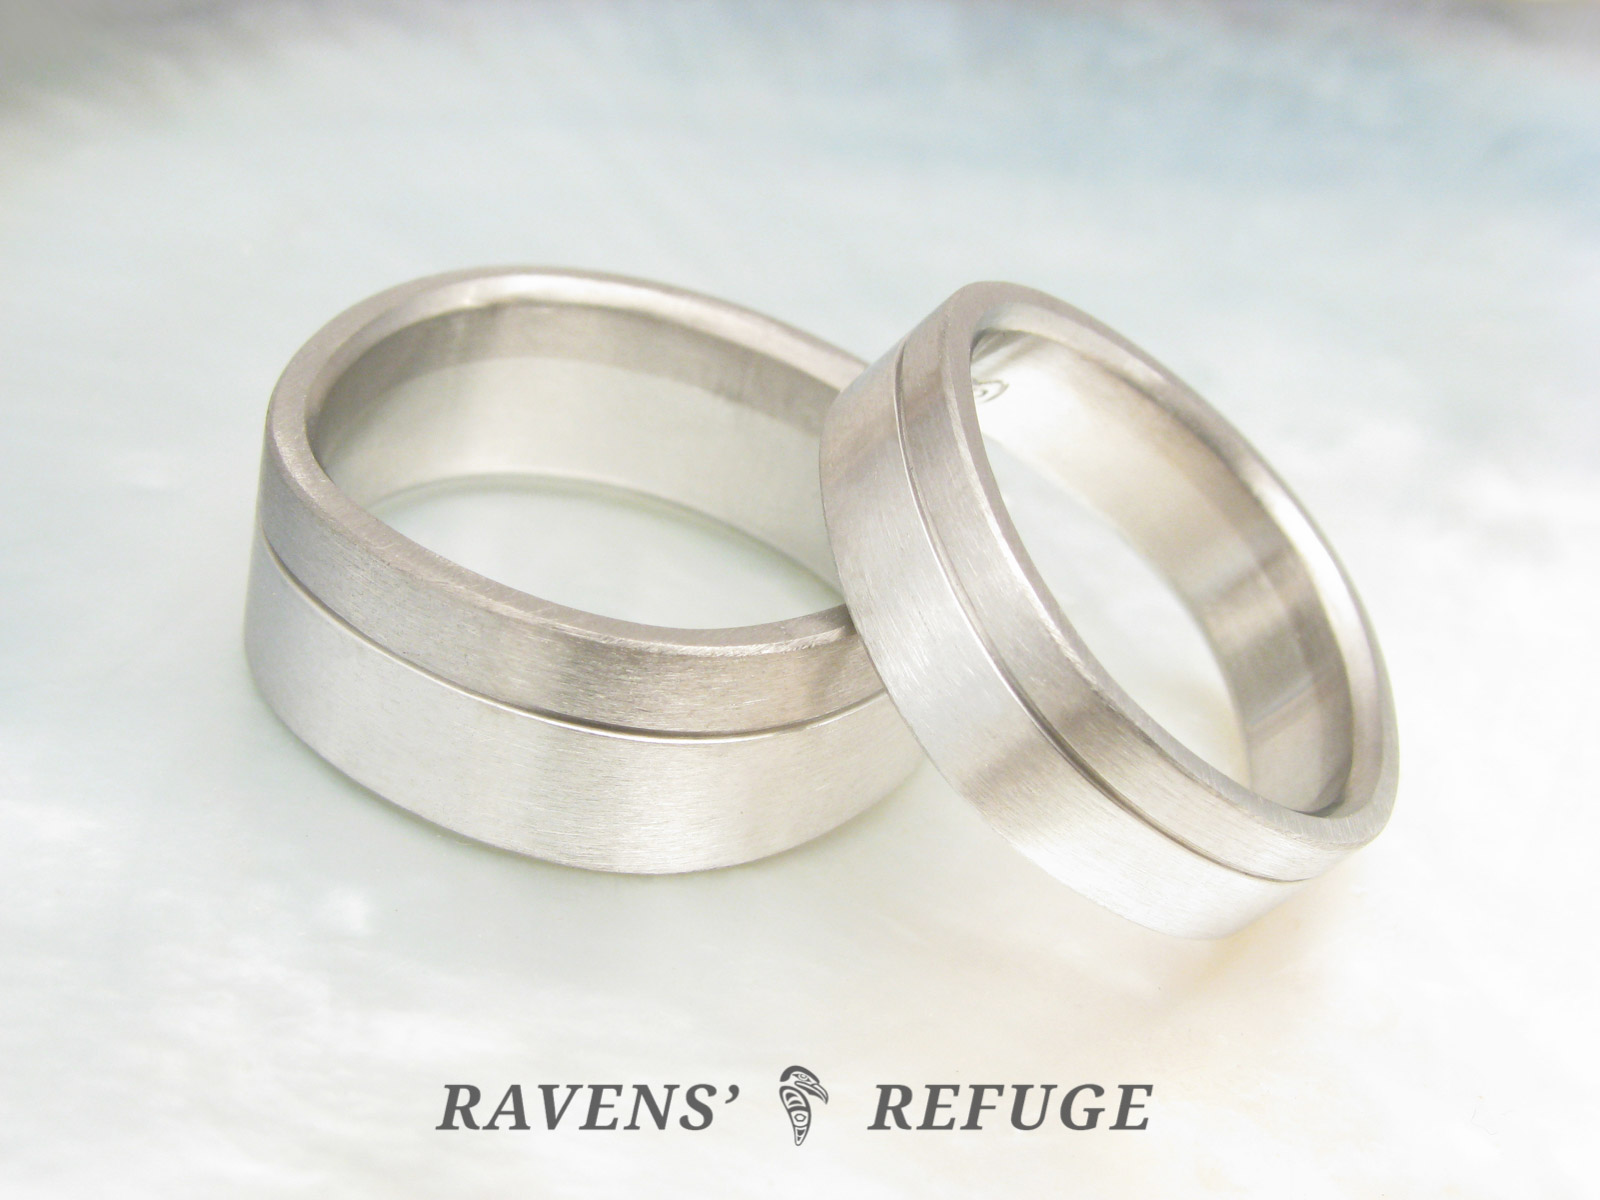 Matching Platinum And Grey Gold Wedding Bands Artisan Hand Forged Ravens' Refuge: Matching Platinum Wedding Bands At Reisefeber.org